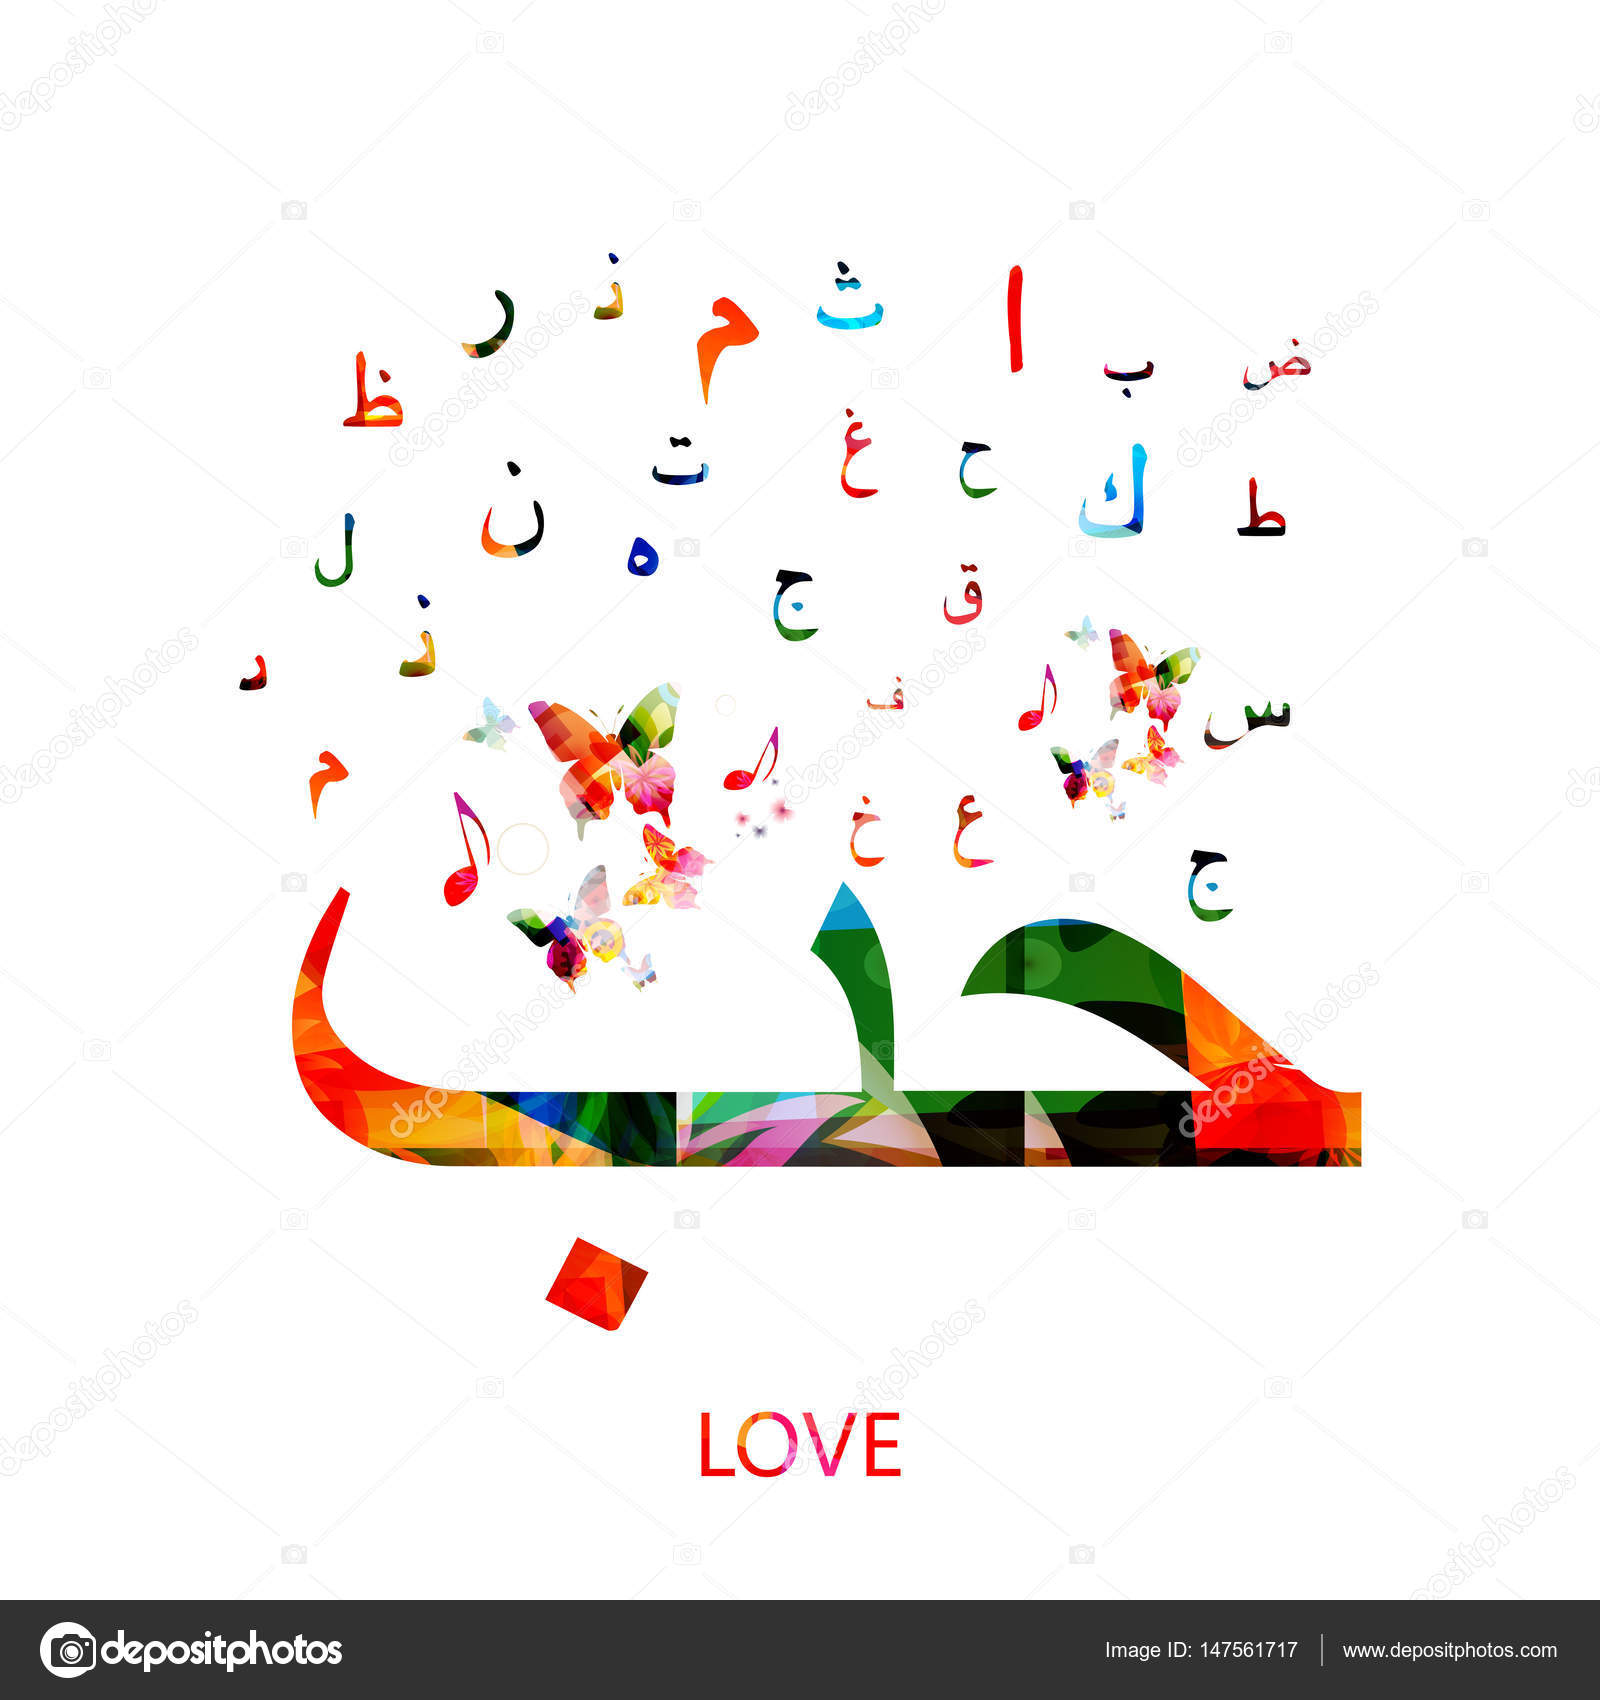 Arabic love word with calligraphy symbols stock vector arabic love word with calligraphy symbols stock vector biocorpaavc